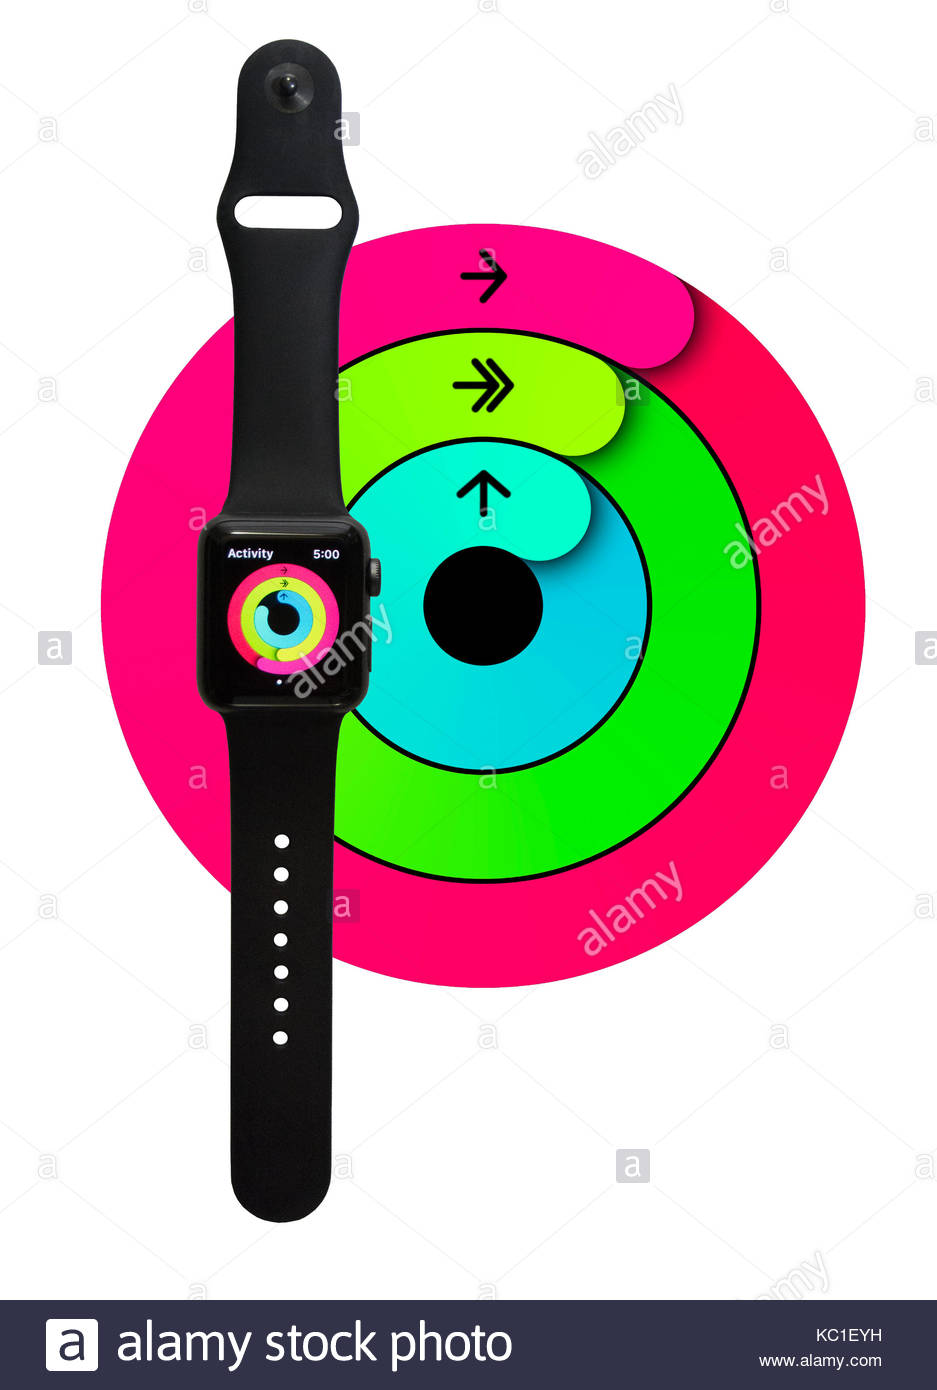 937x1390 Apple Watch Series 2 Stock Photos Amp Apple Watch Series 2 Stock